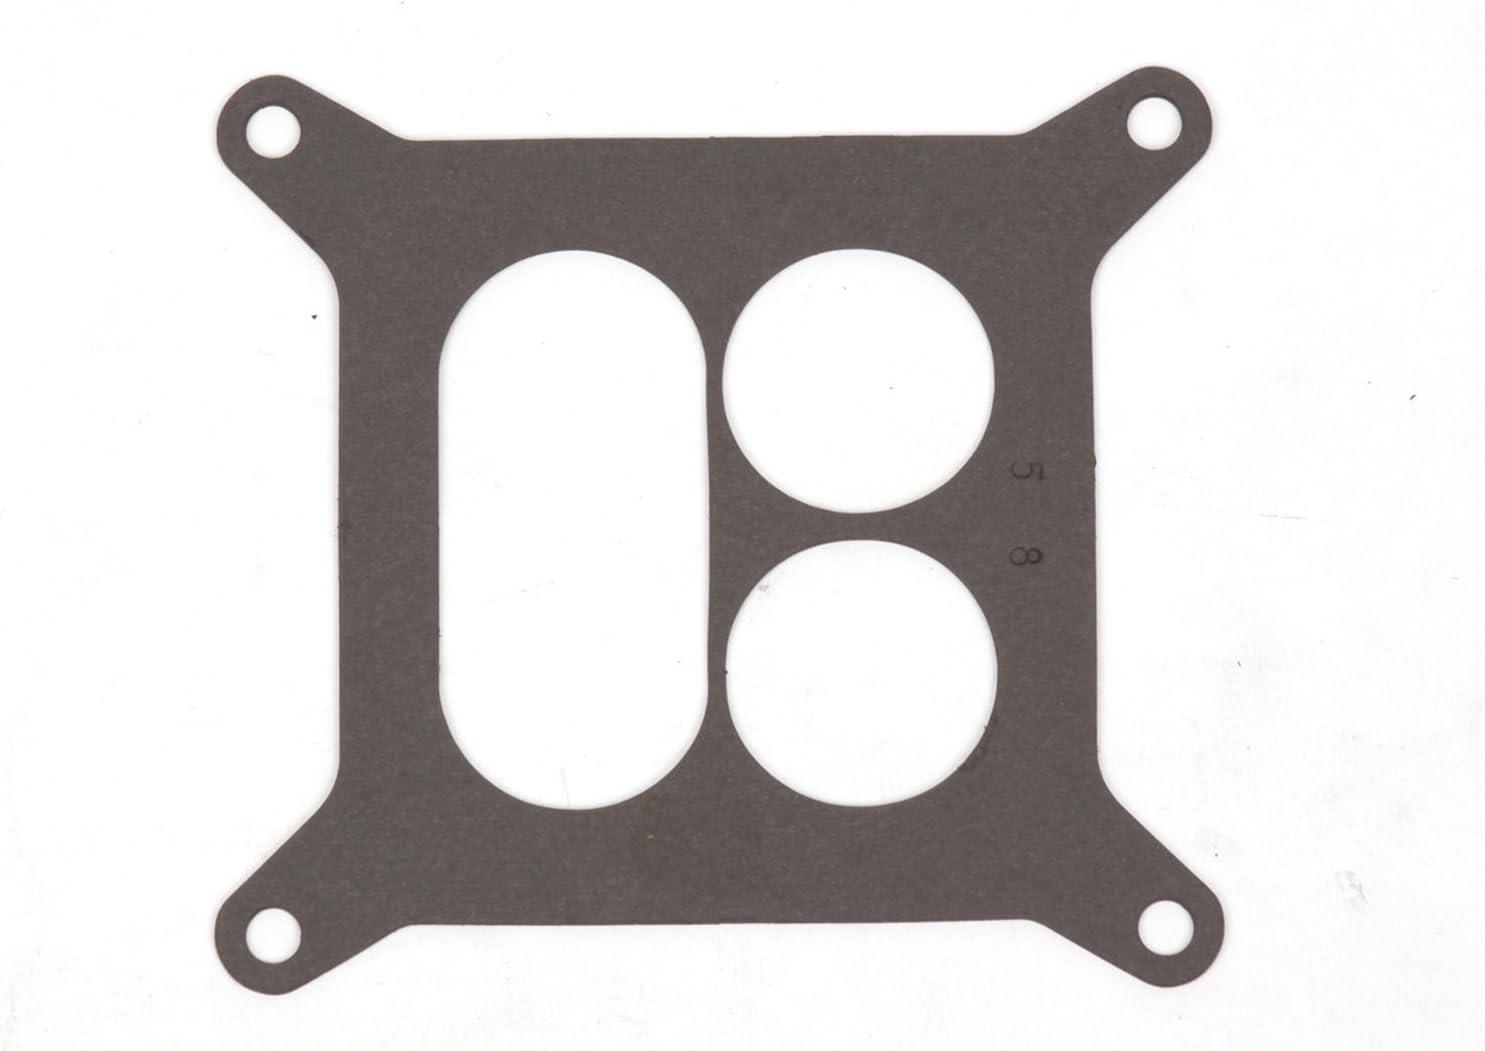 Taichisensors ABS Wheel Speed Sensor for Dodge Ram Van Front Right #56028176AB ALS35 ALS35 VSS101 VSS101 56028176AC 56028176AD 100/% Tested